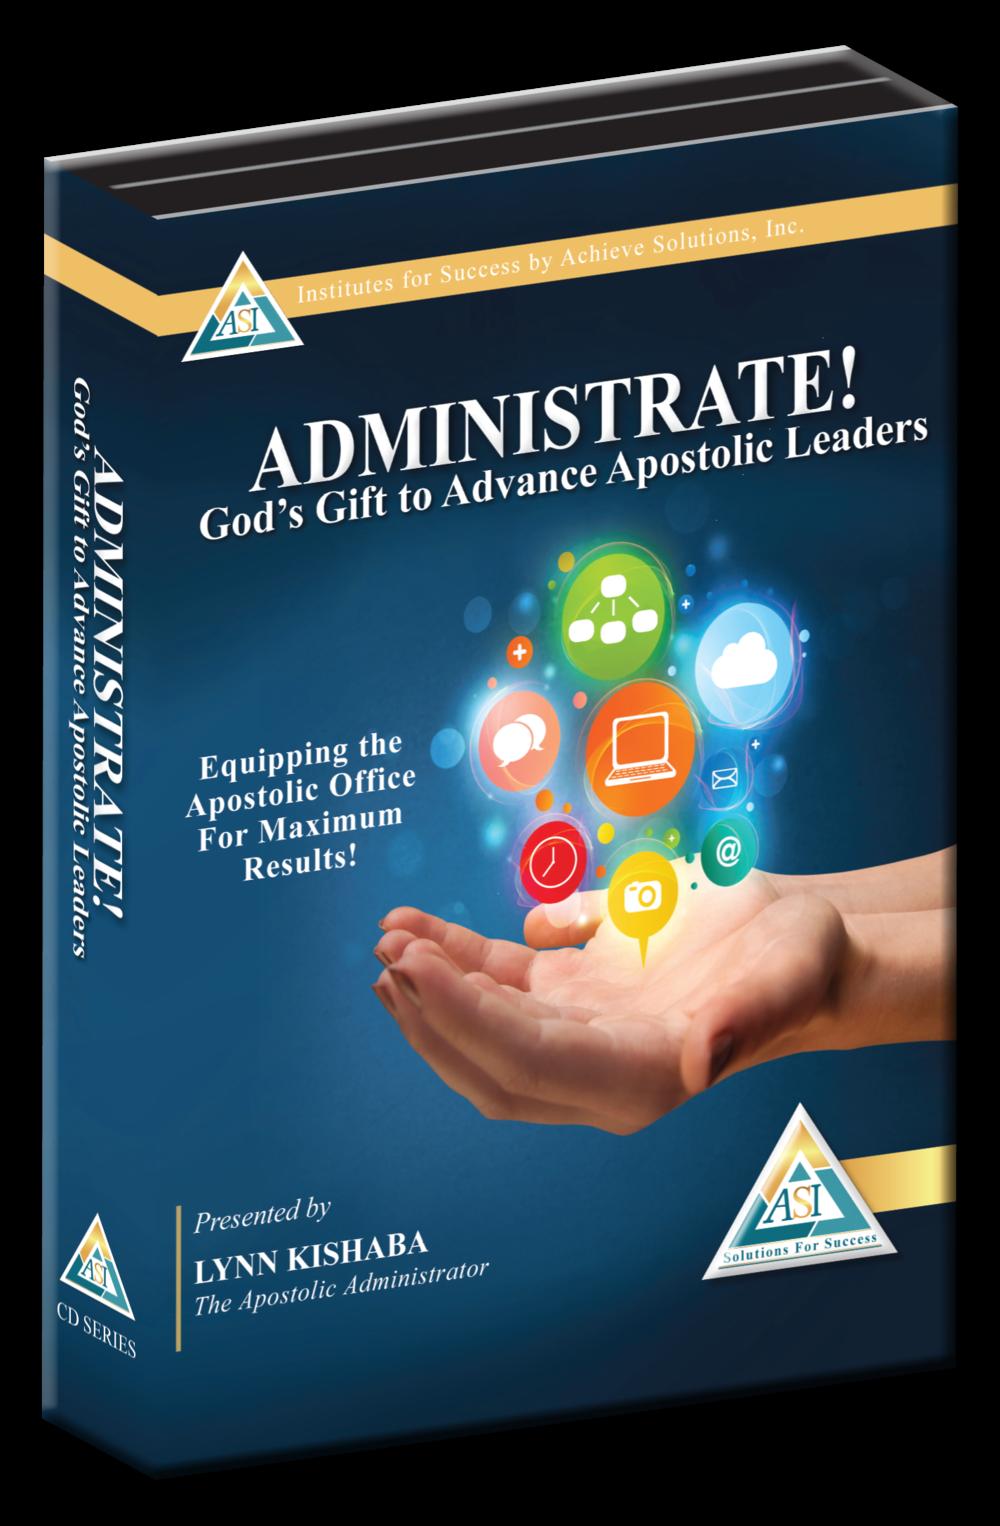 Order the Full seminar  by Lynn Kishaba, - the Ical apostolic administrator